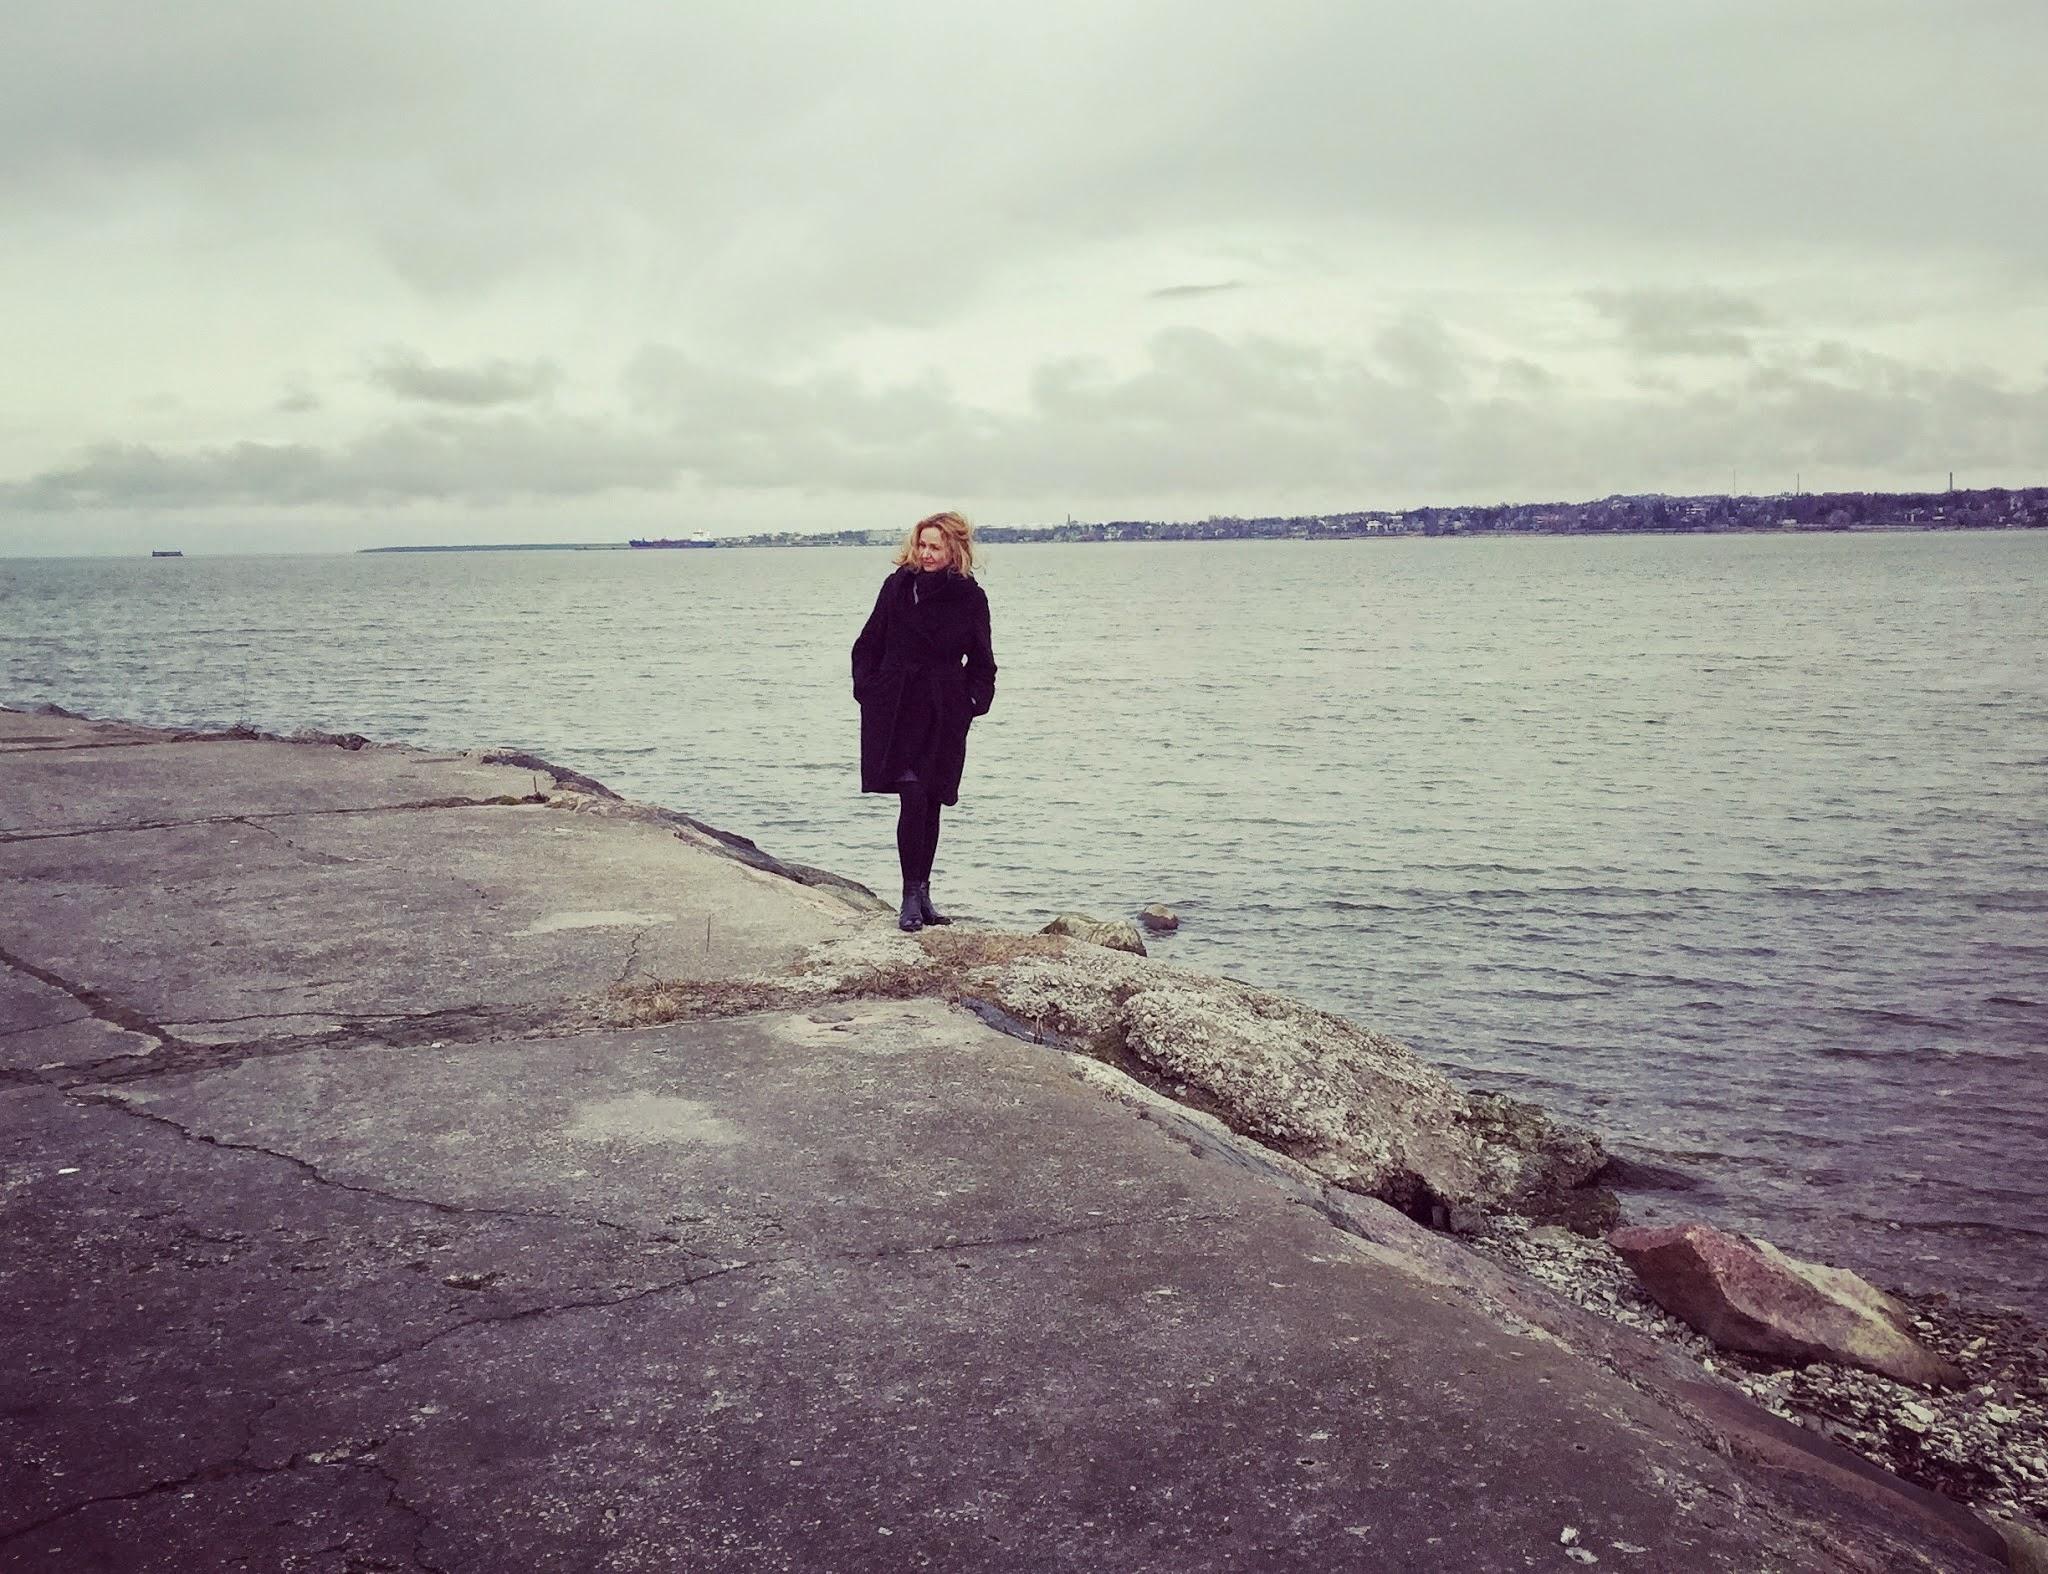 Piritos prieplauka ir Baltijos jūra